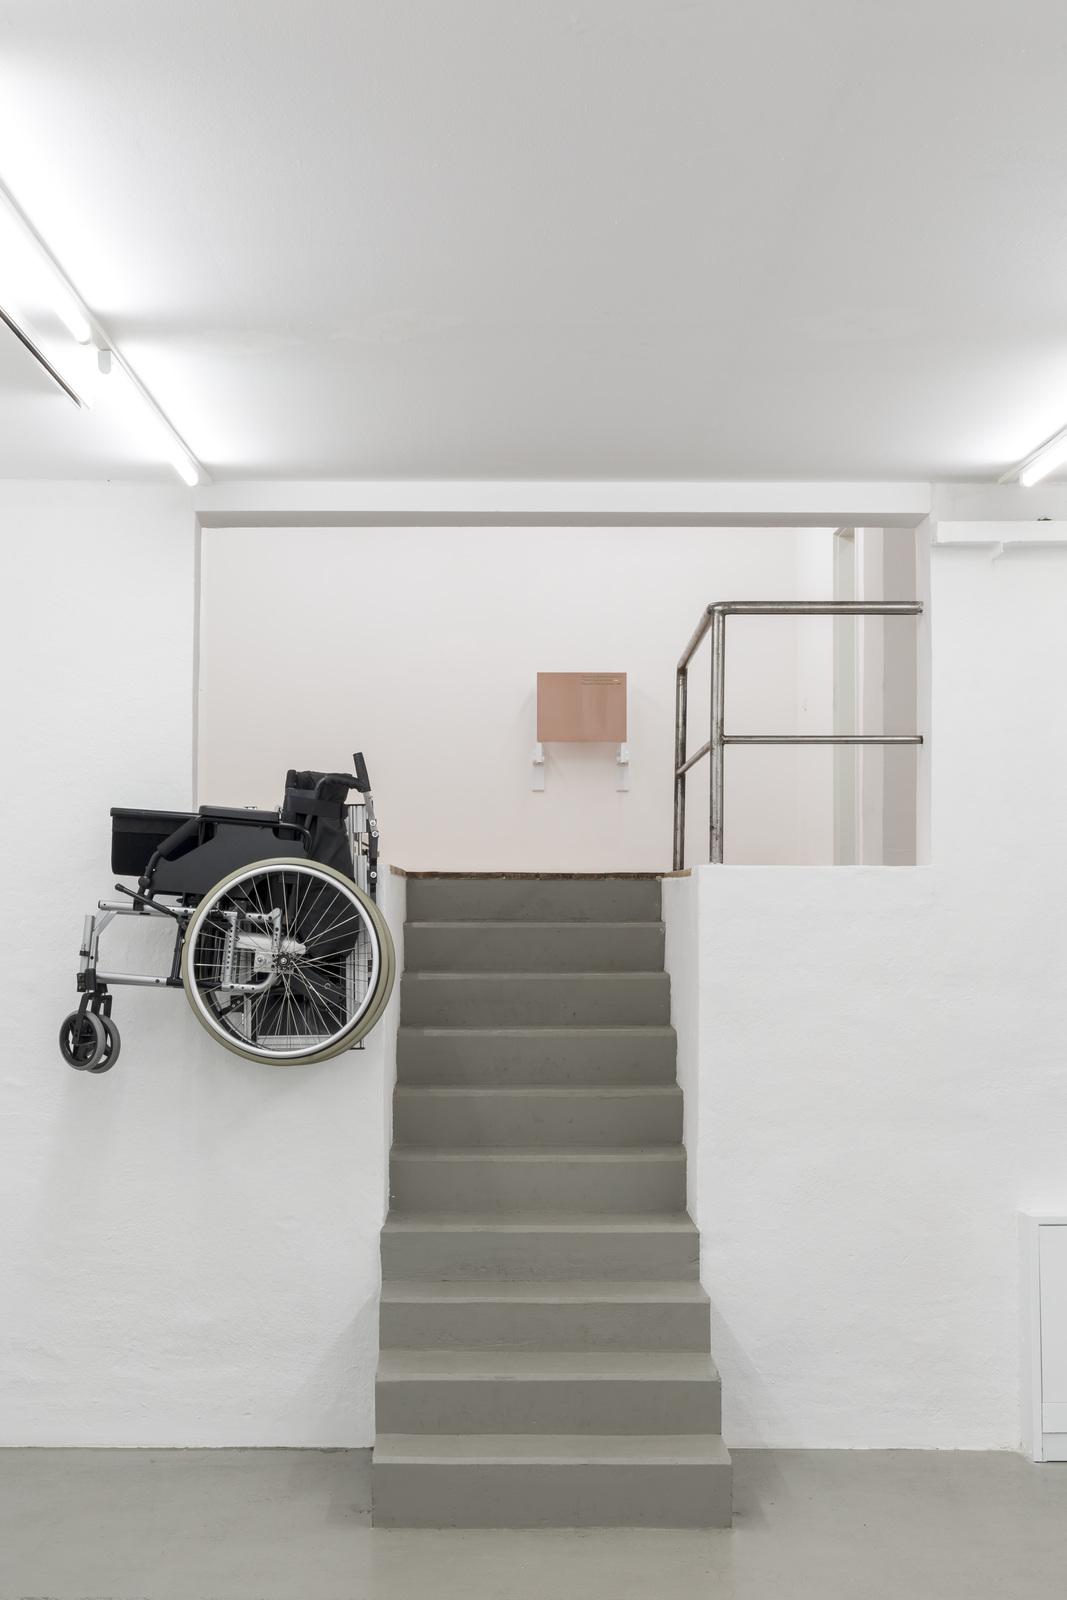 Matthias_Sohr_ACUD_gallery_04_installation_view